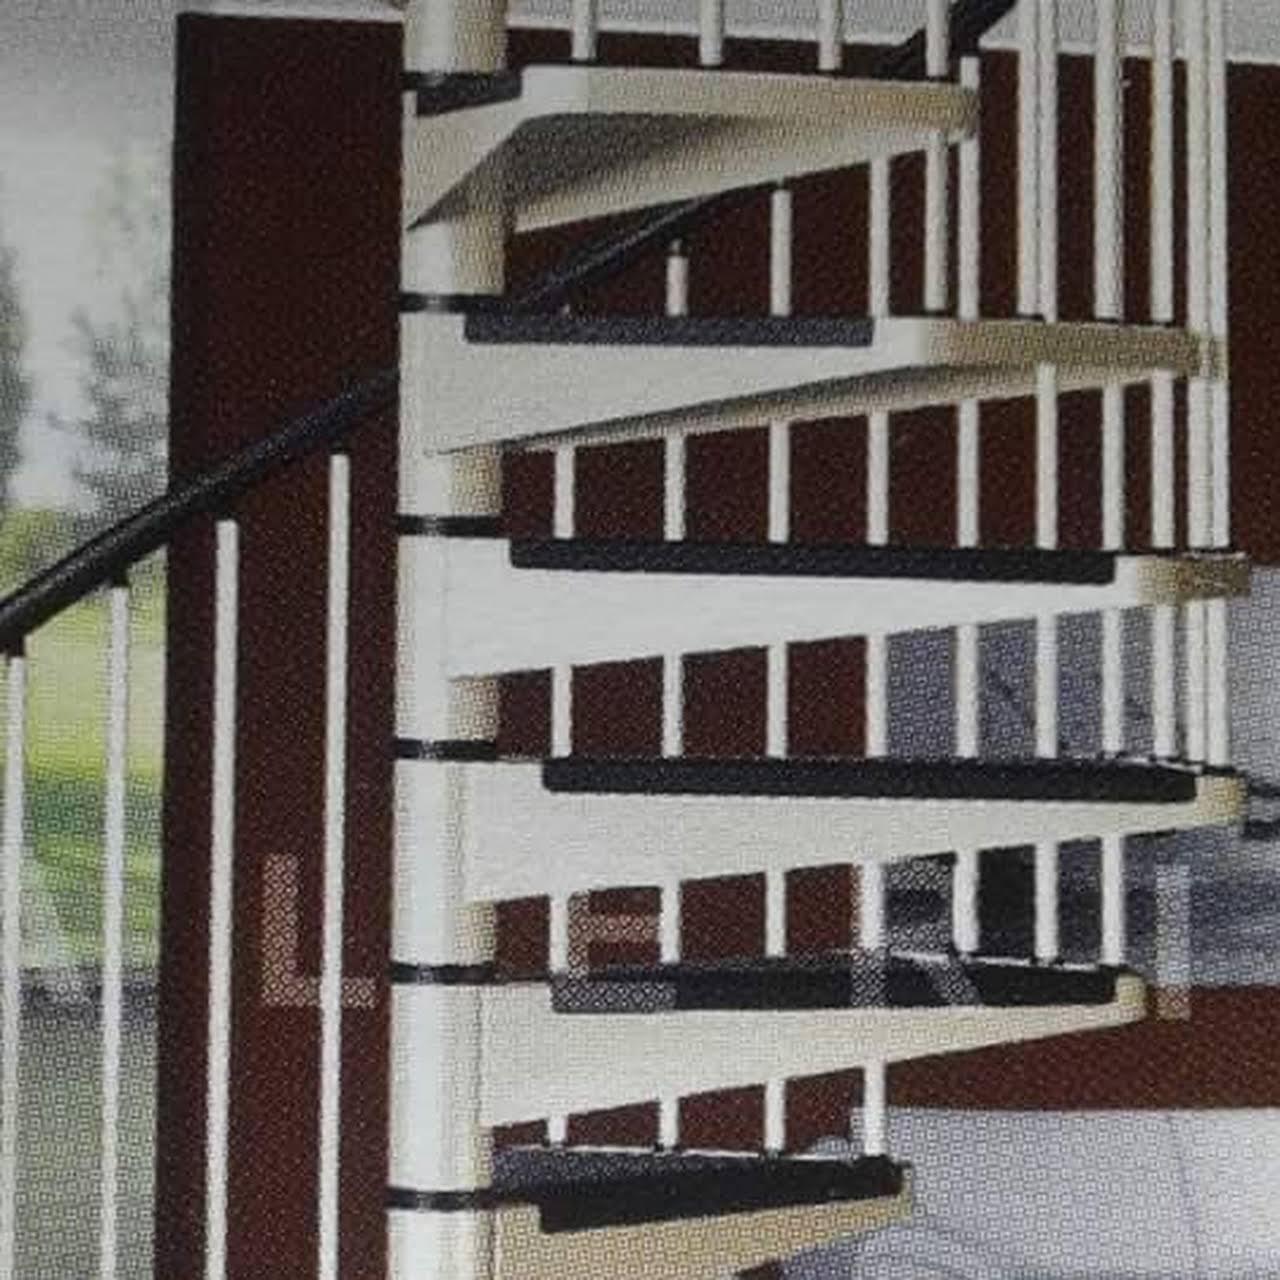 baja ringan murah kudus kabupaten jawa tengah 59313 bengkel las rossi jaya melayani pagar pintu tralis